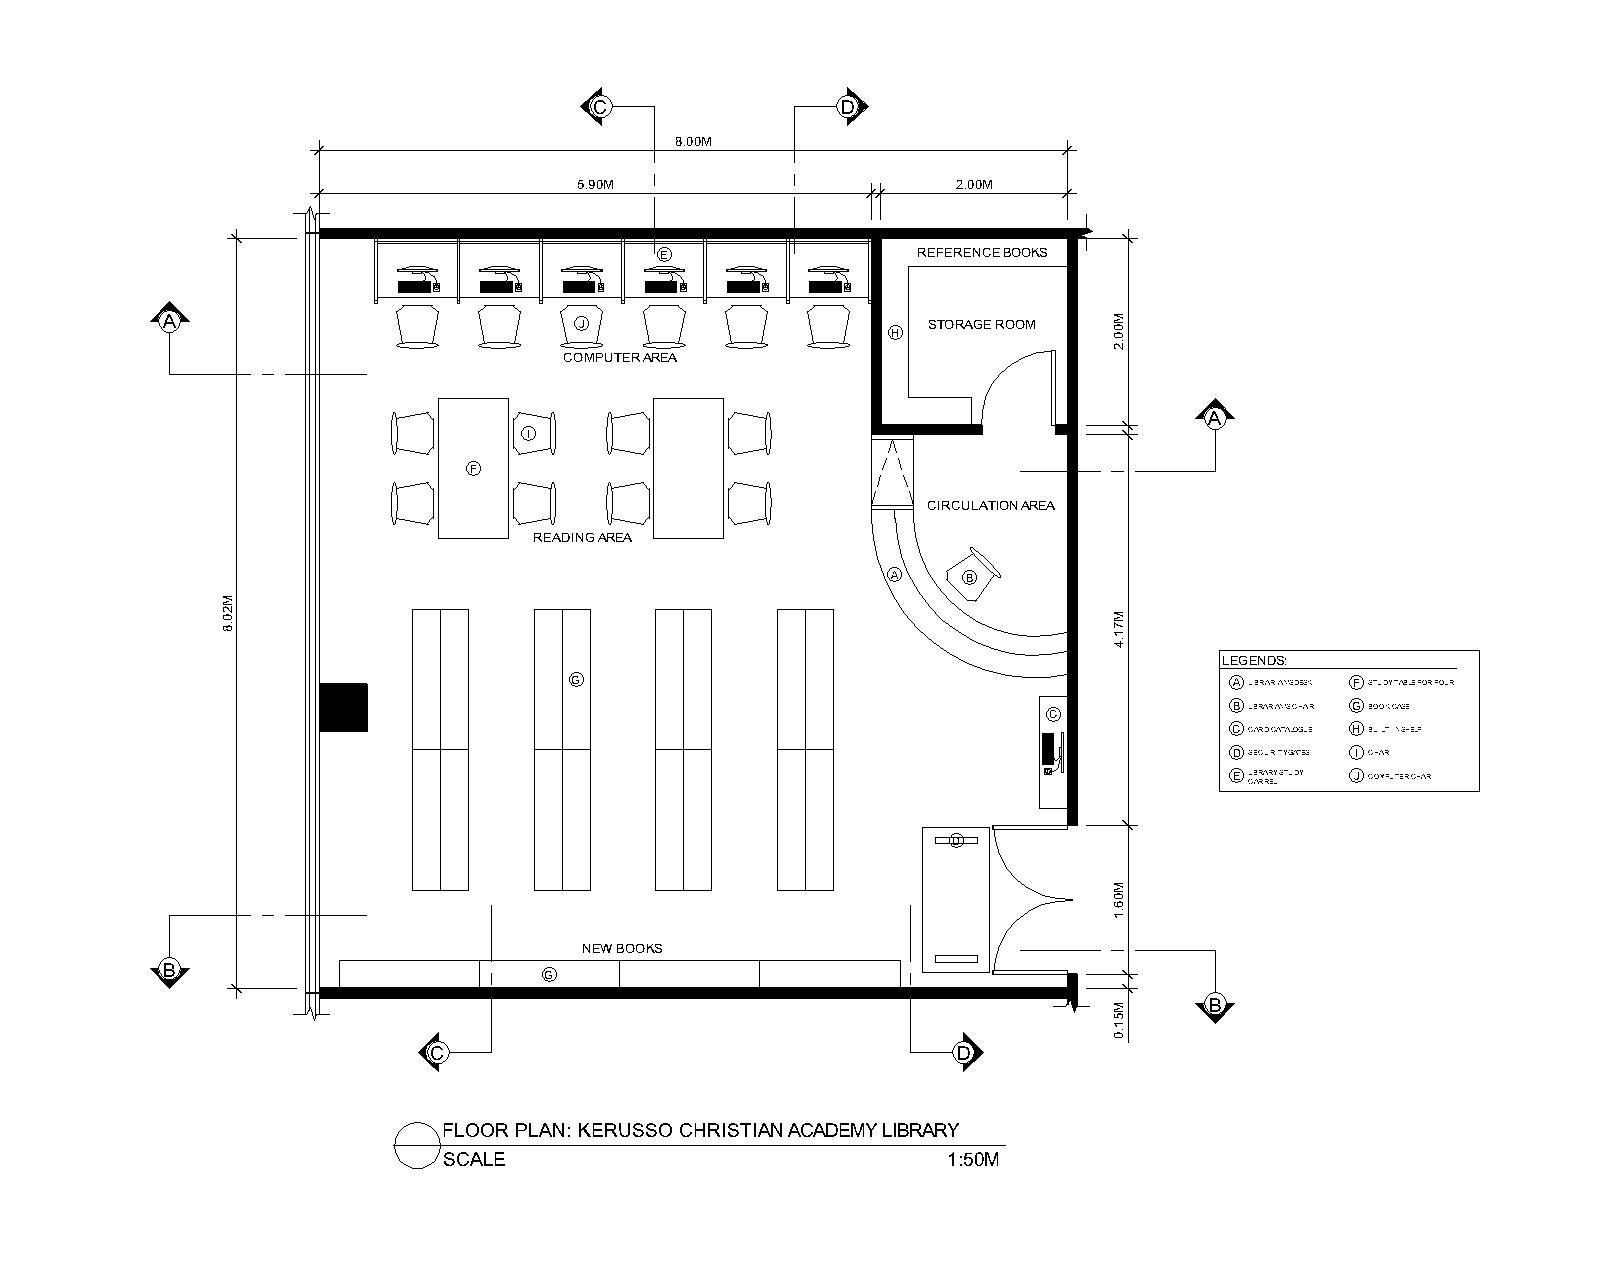 school library design layout   Google Search. school library design layout   Google Search   Renovating School